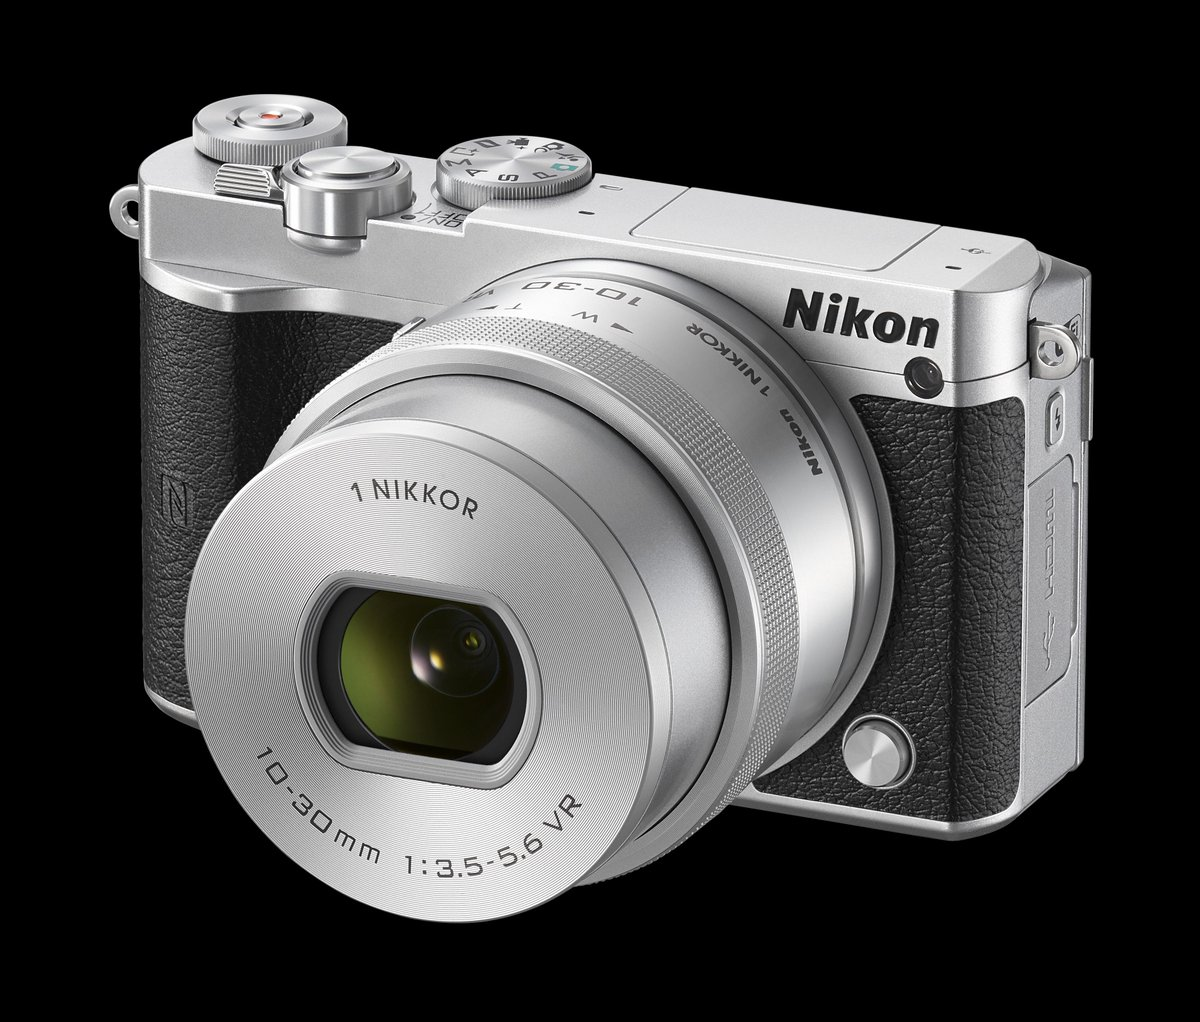 Nikon Canada on Twitter: